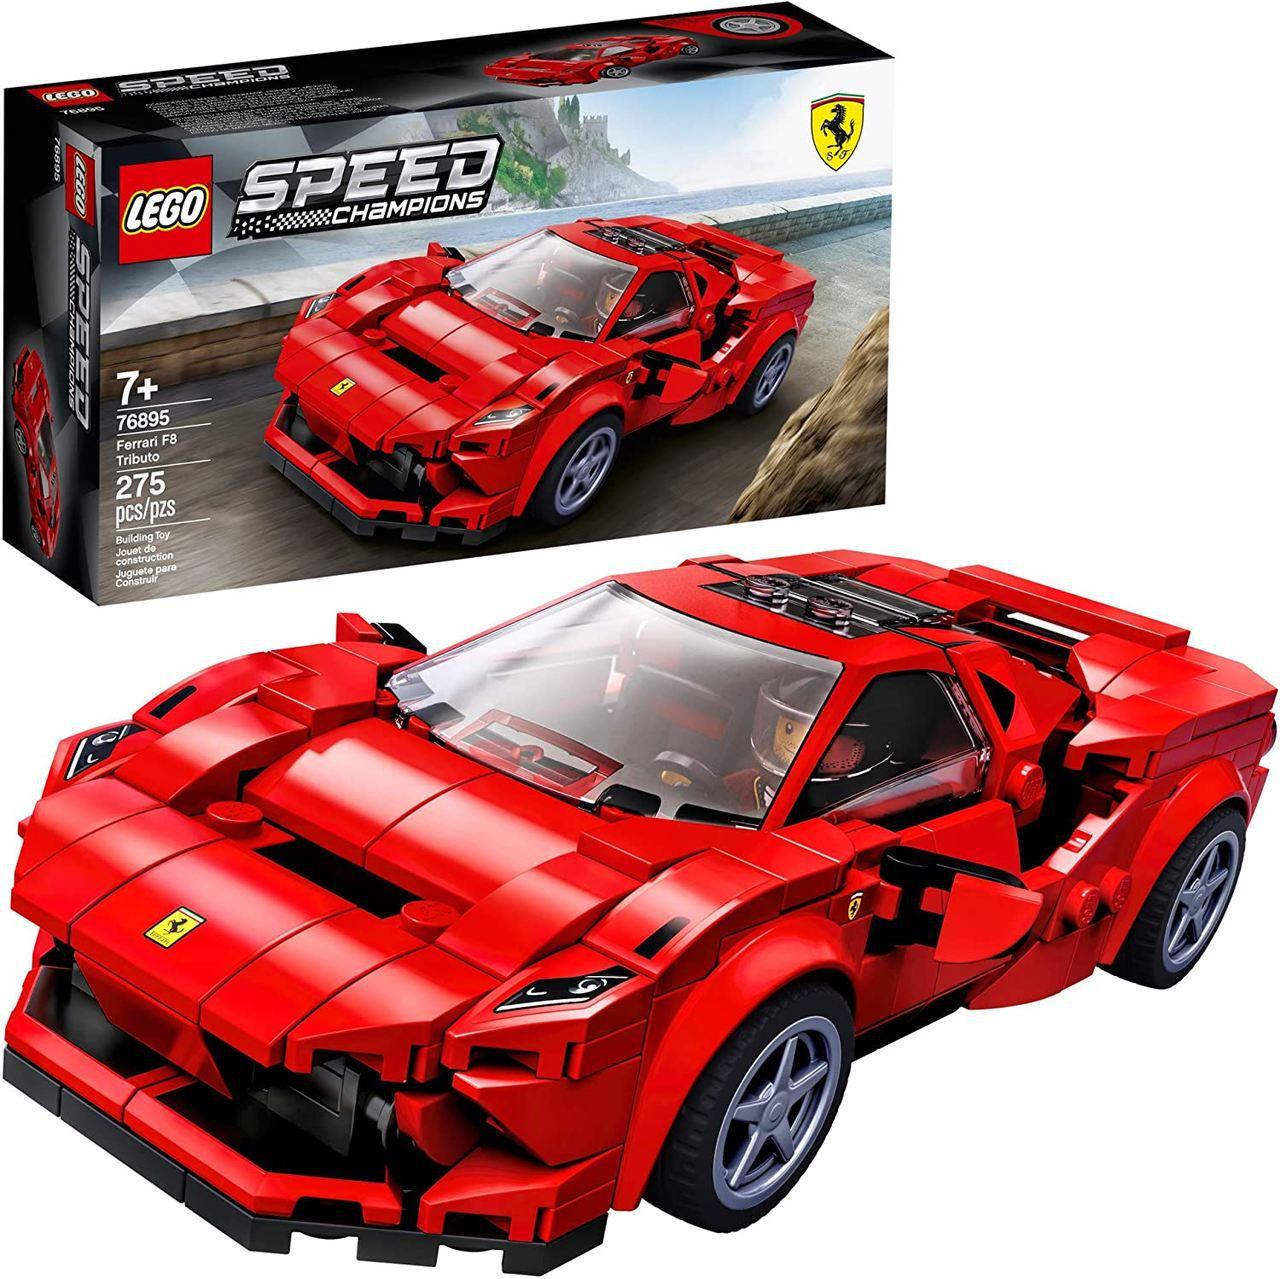 Lego Ferrari F8 Tributo Speed Champions 275 Peças - 76895